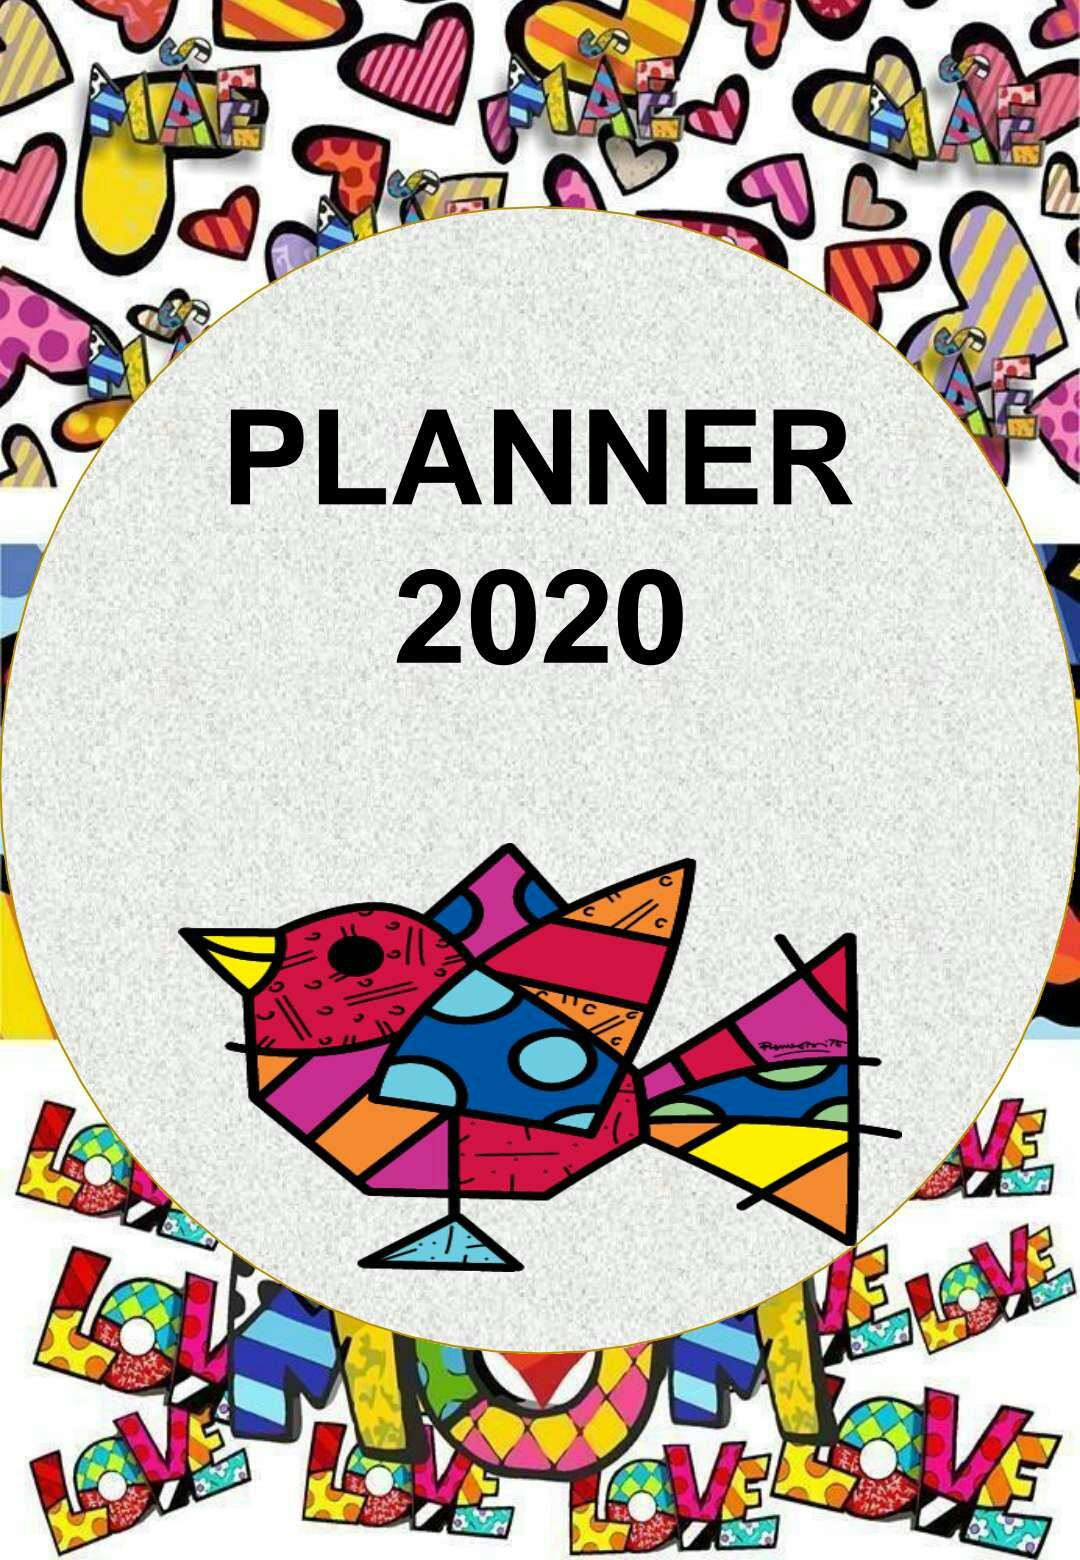 Blog Educacao E Transformacao Planner 2020 Romero Brito